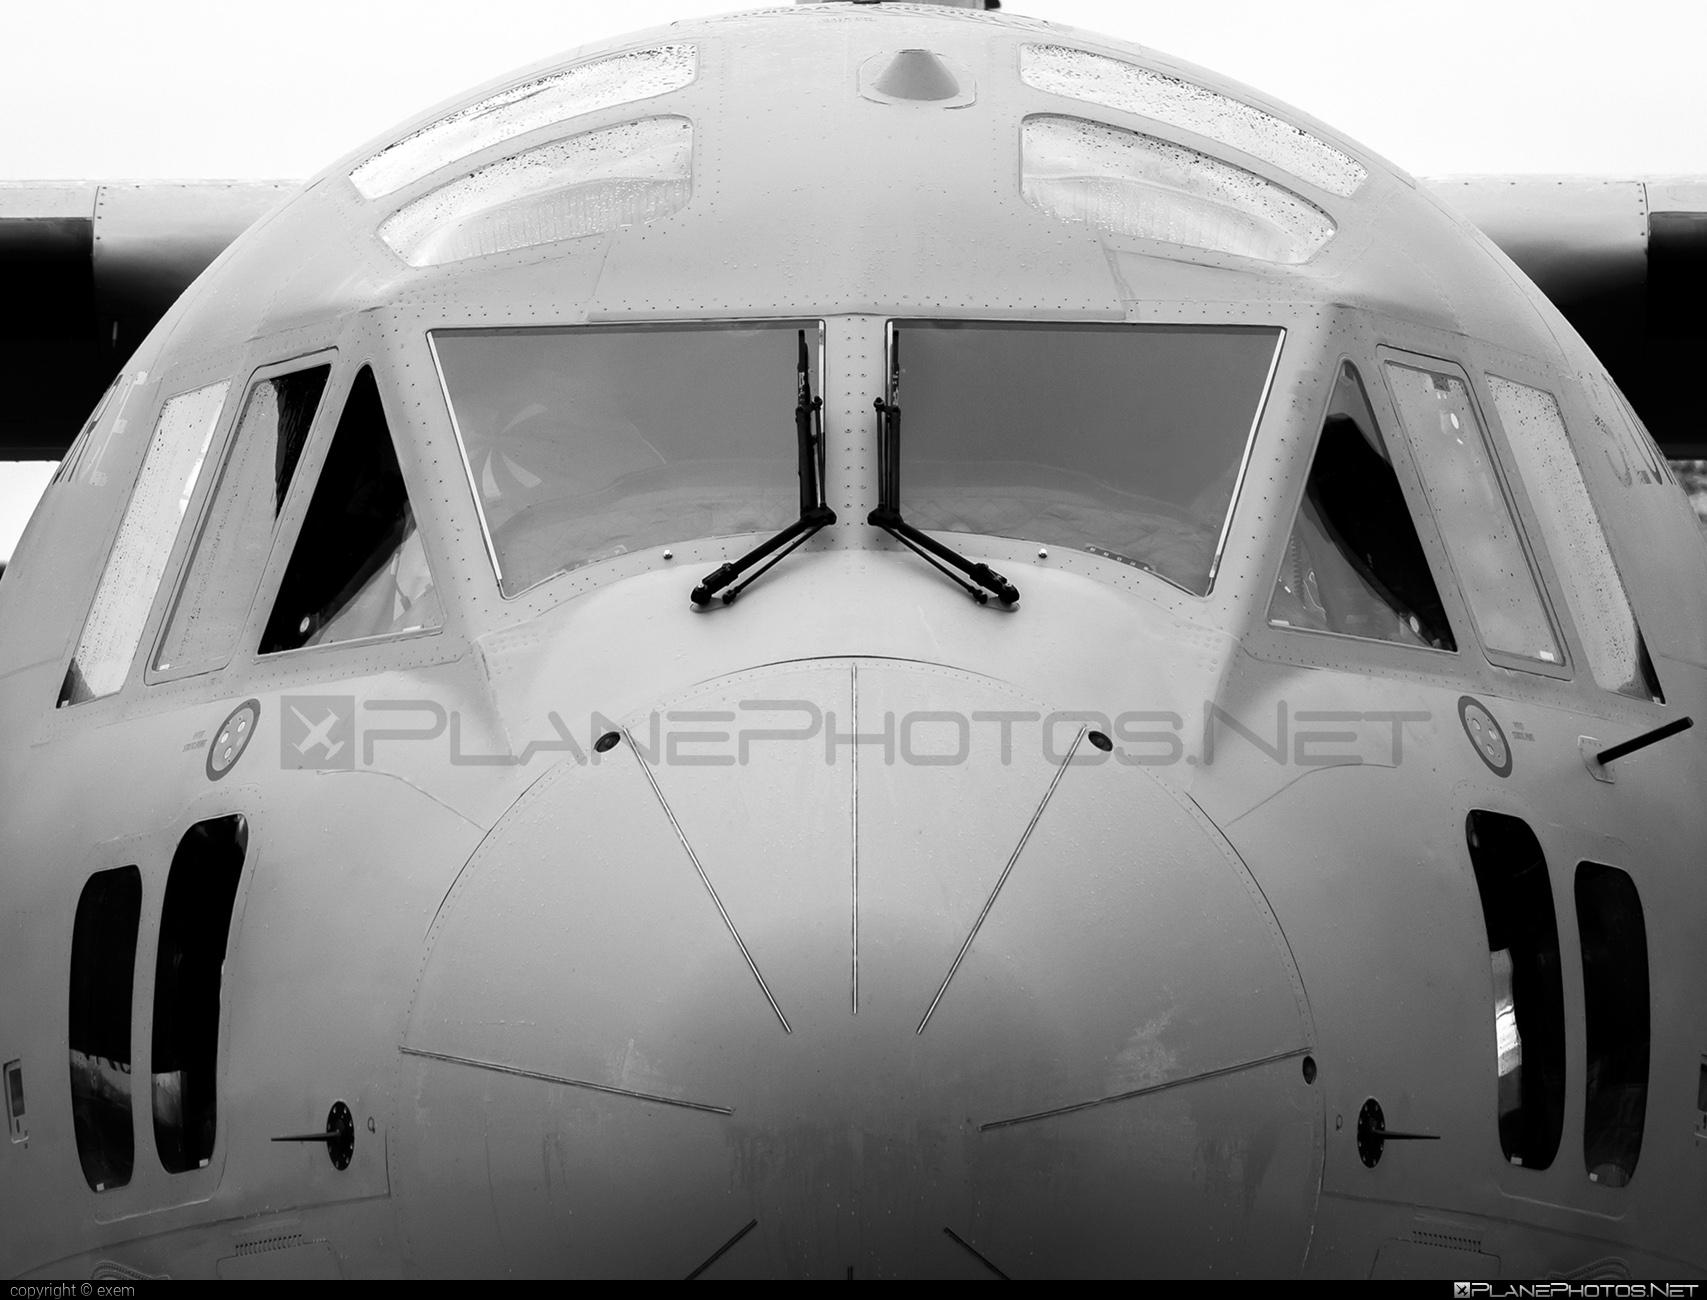 Leonardo C-27J Spartan - 1931 operated by Vzdušné sily OS SR (Slovak Air Force) #c27j #c27jspartan #c27spartan #leonardo #leonardo27j #leonardoc27jspartan #leonardospartan #slovakairforce #vzdusnesilyossr